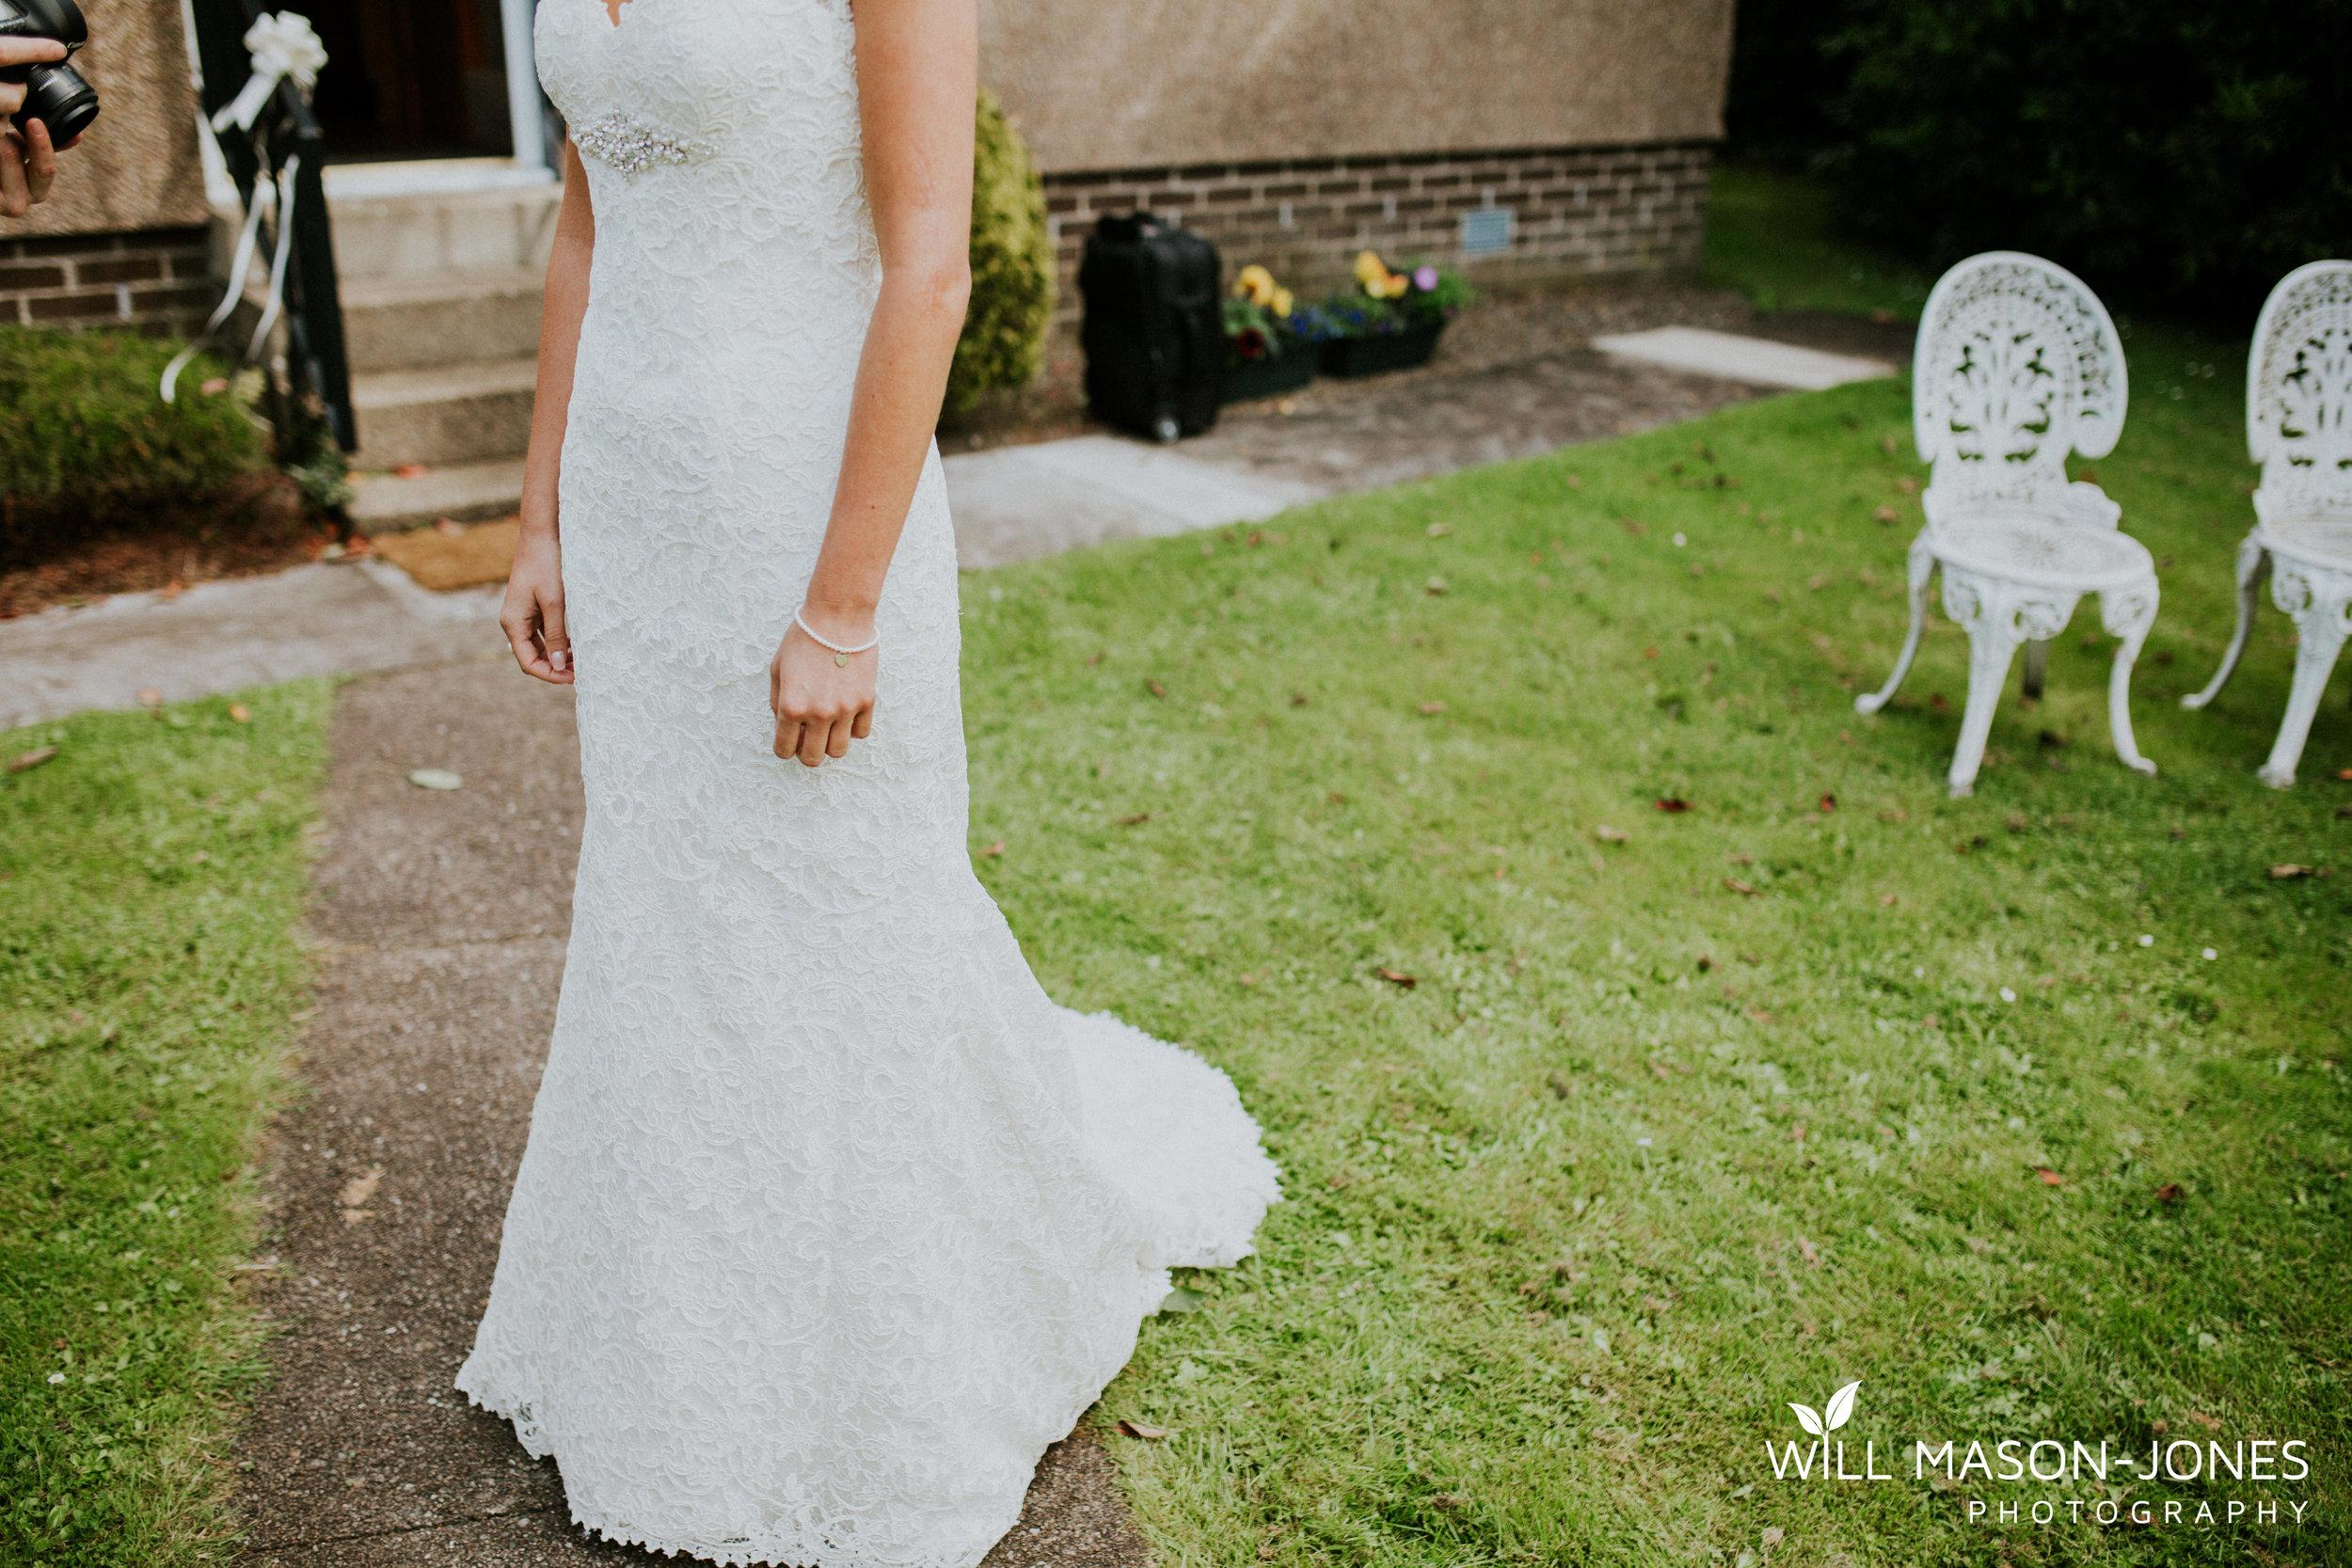 loch-lomond-destination-wedding-photographer-scotland-uk-wales-27.jpg